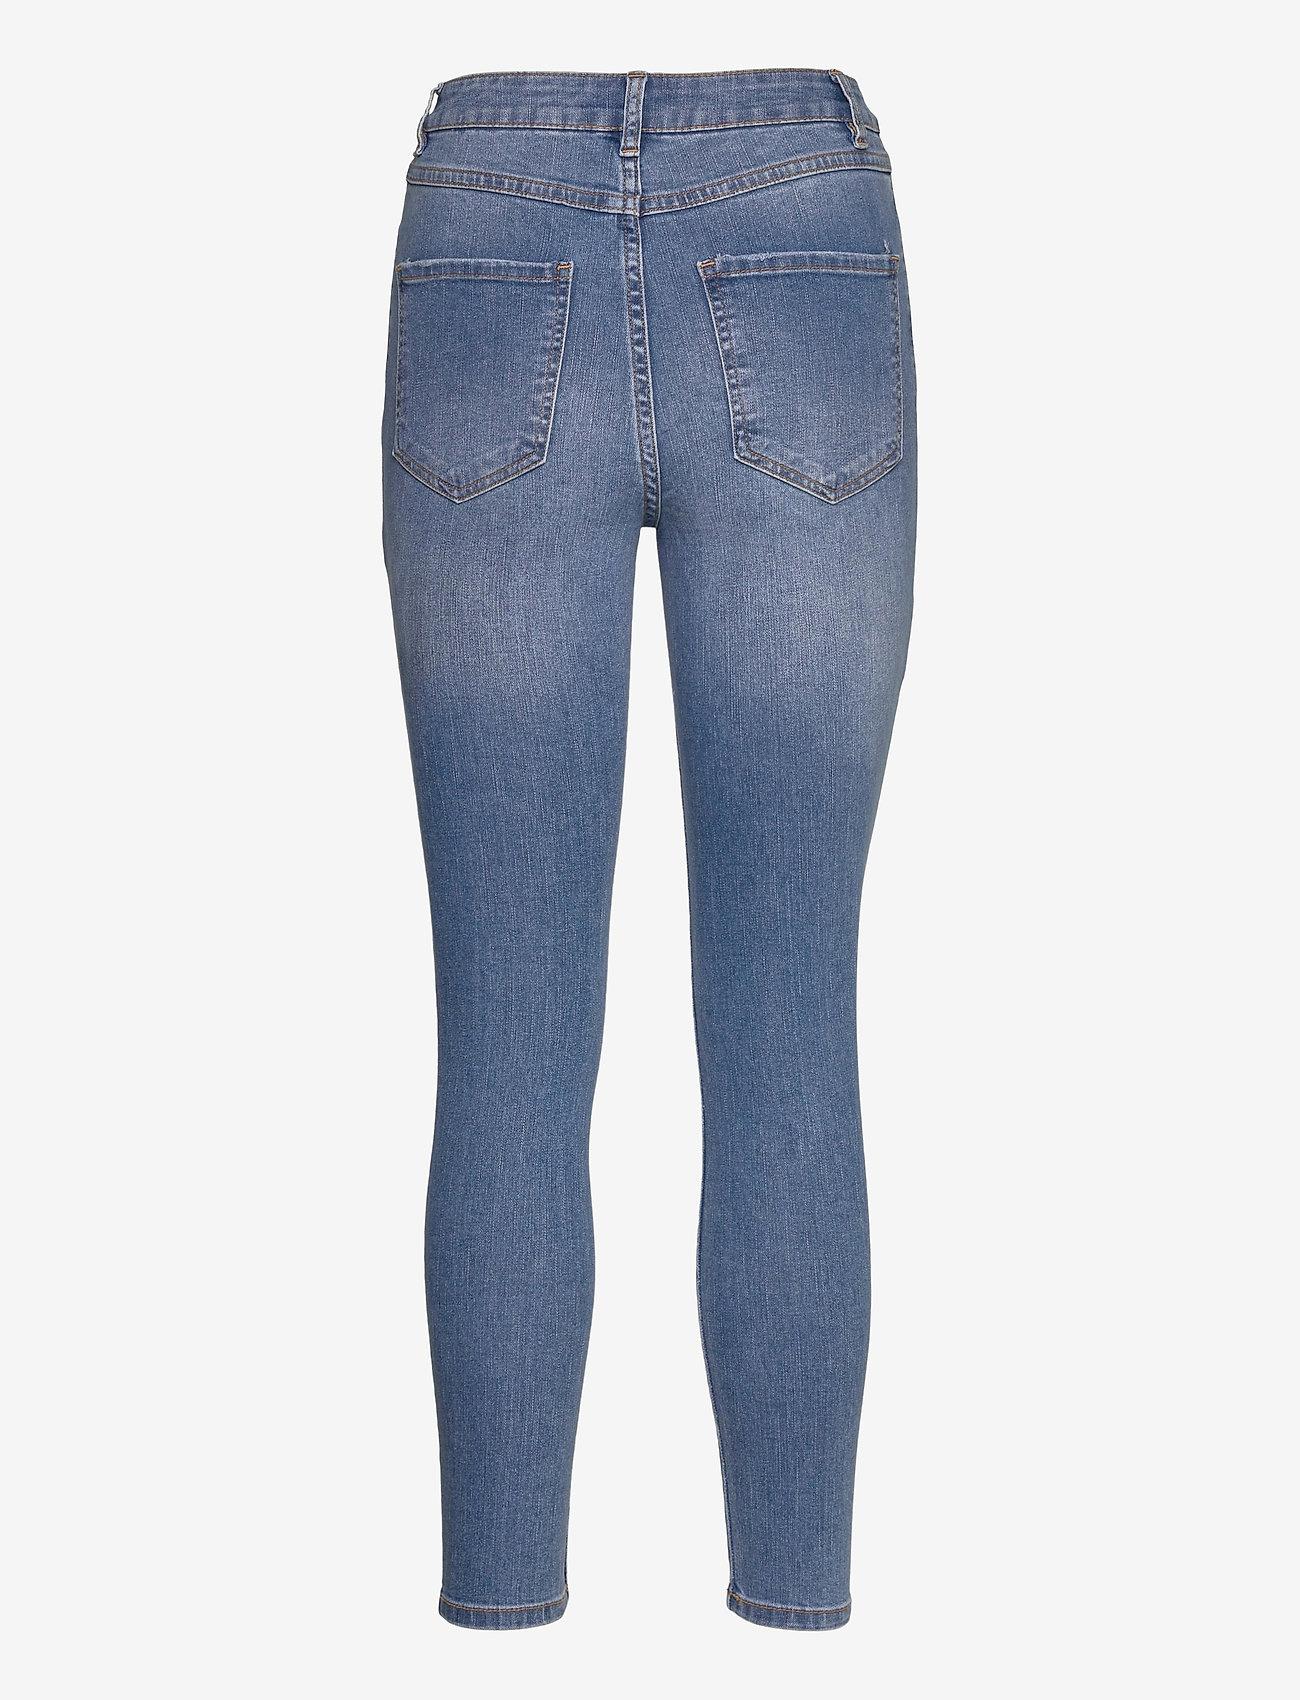 Vila - VIEKKO HWSK 7/8 JEANS/SU - - skinny jeans - medium blue denim - 1